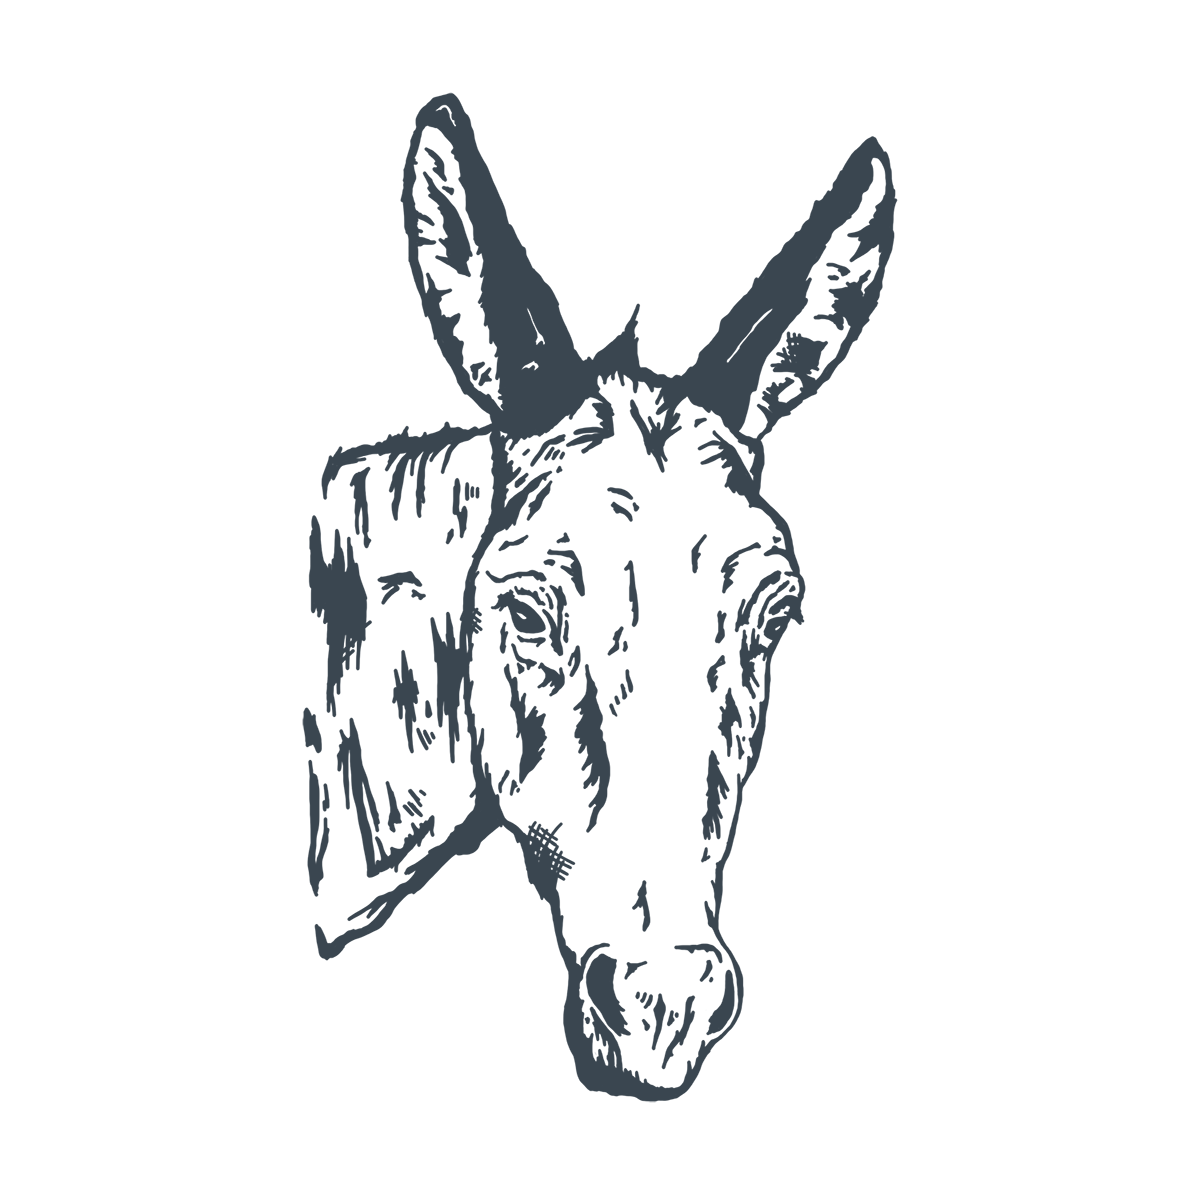 donkey-01.png